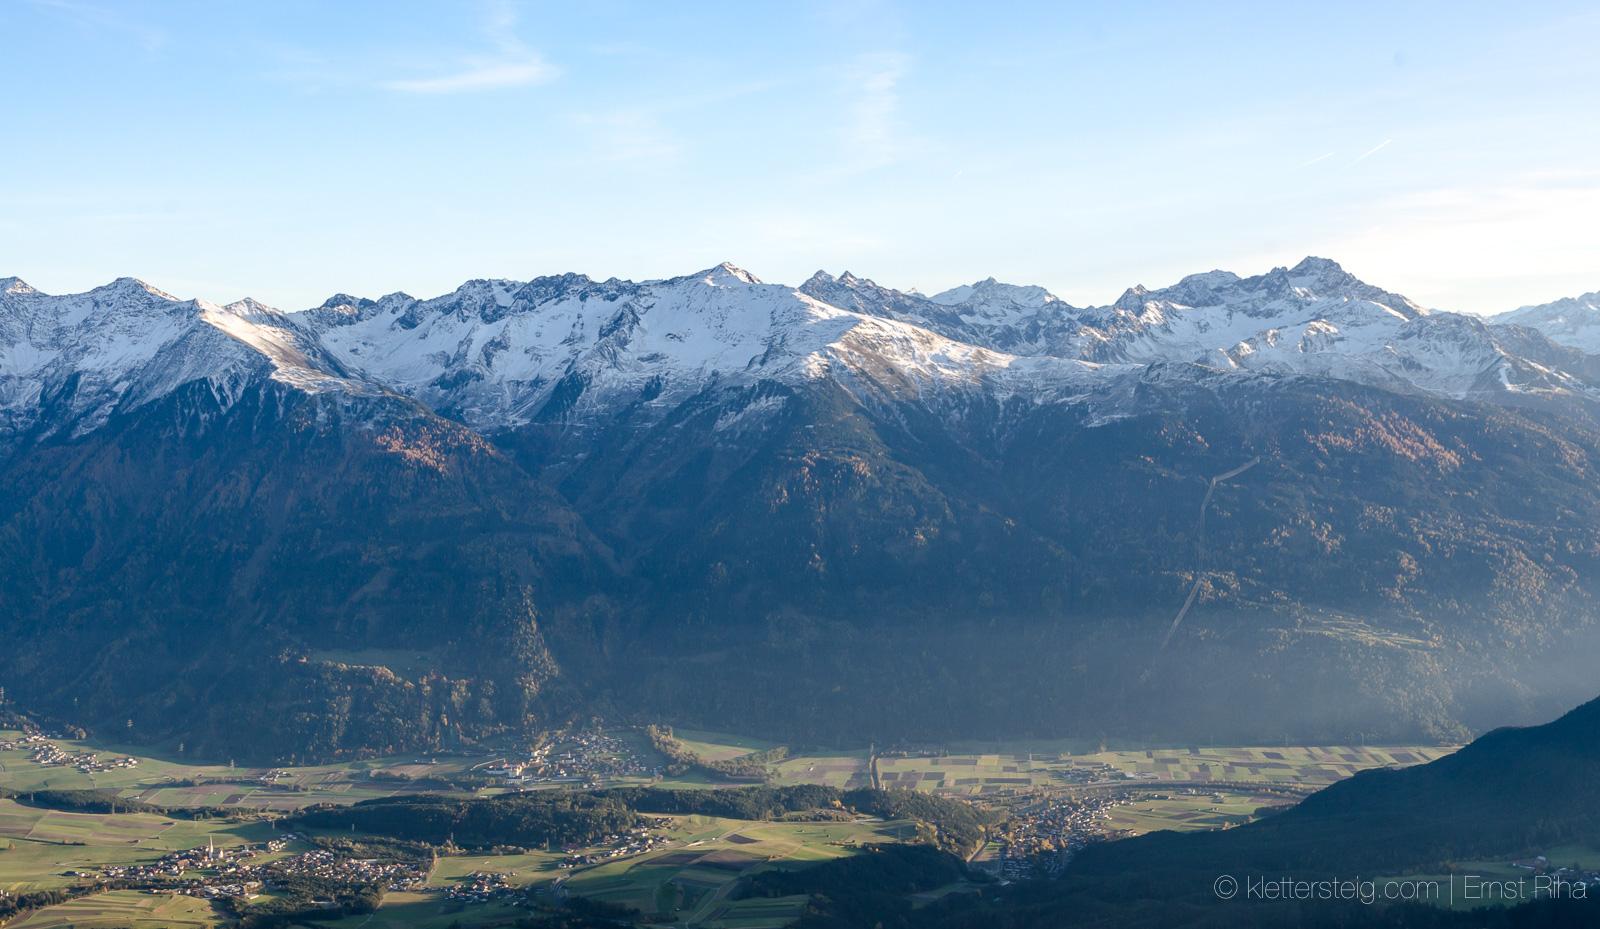 Wank Klettersteig